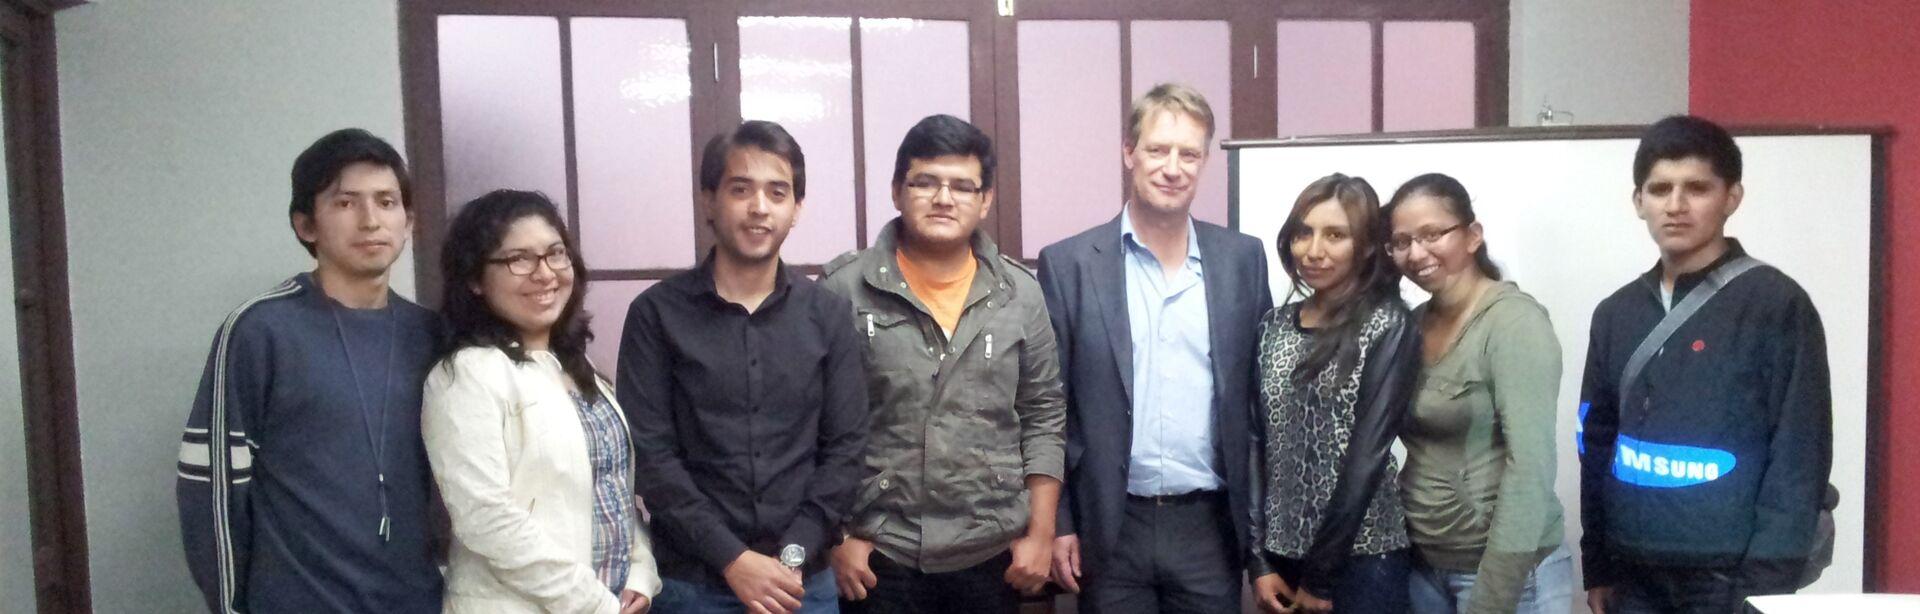 Entrepreneurs in Tarija improve their communication skills